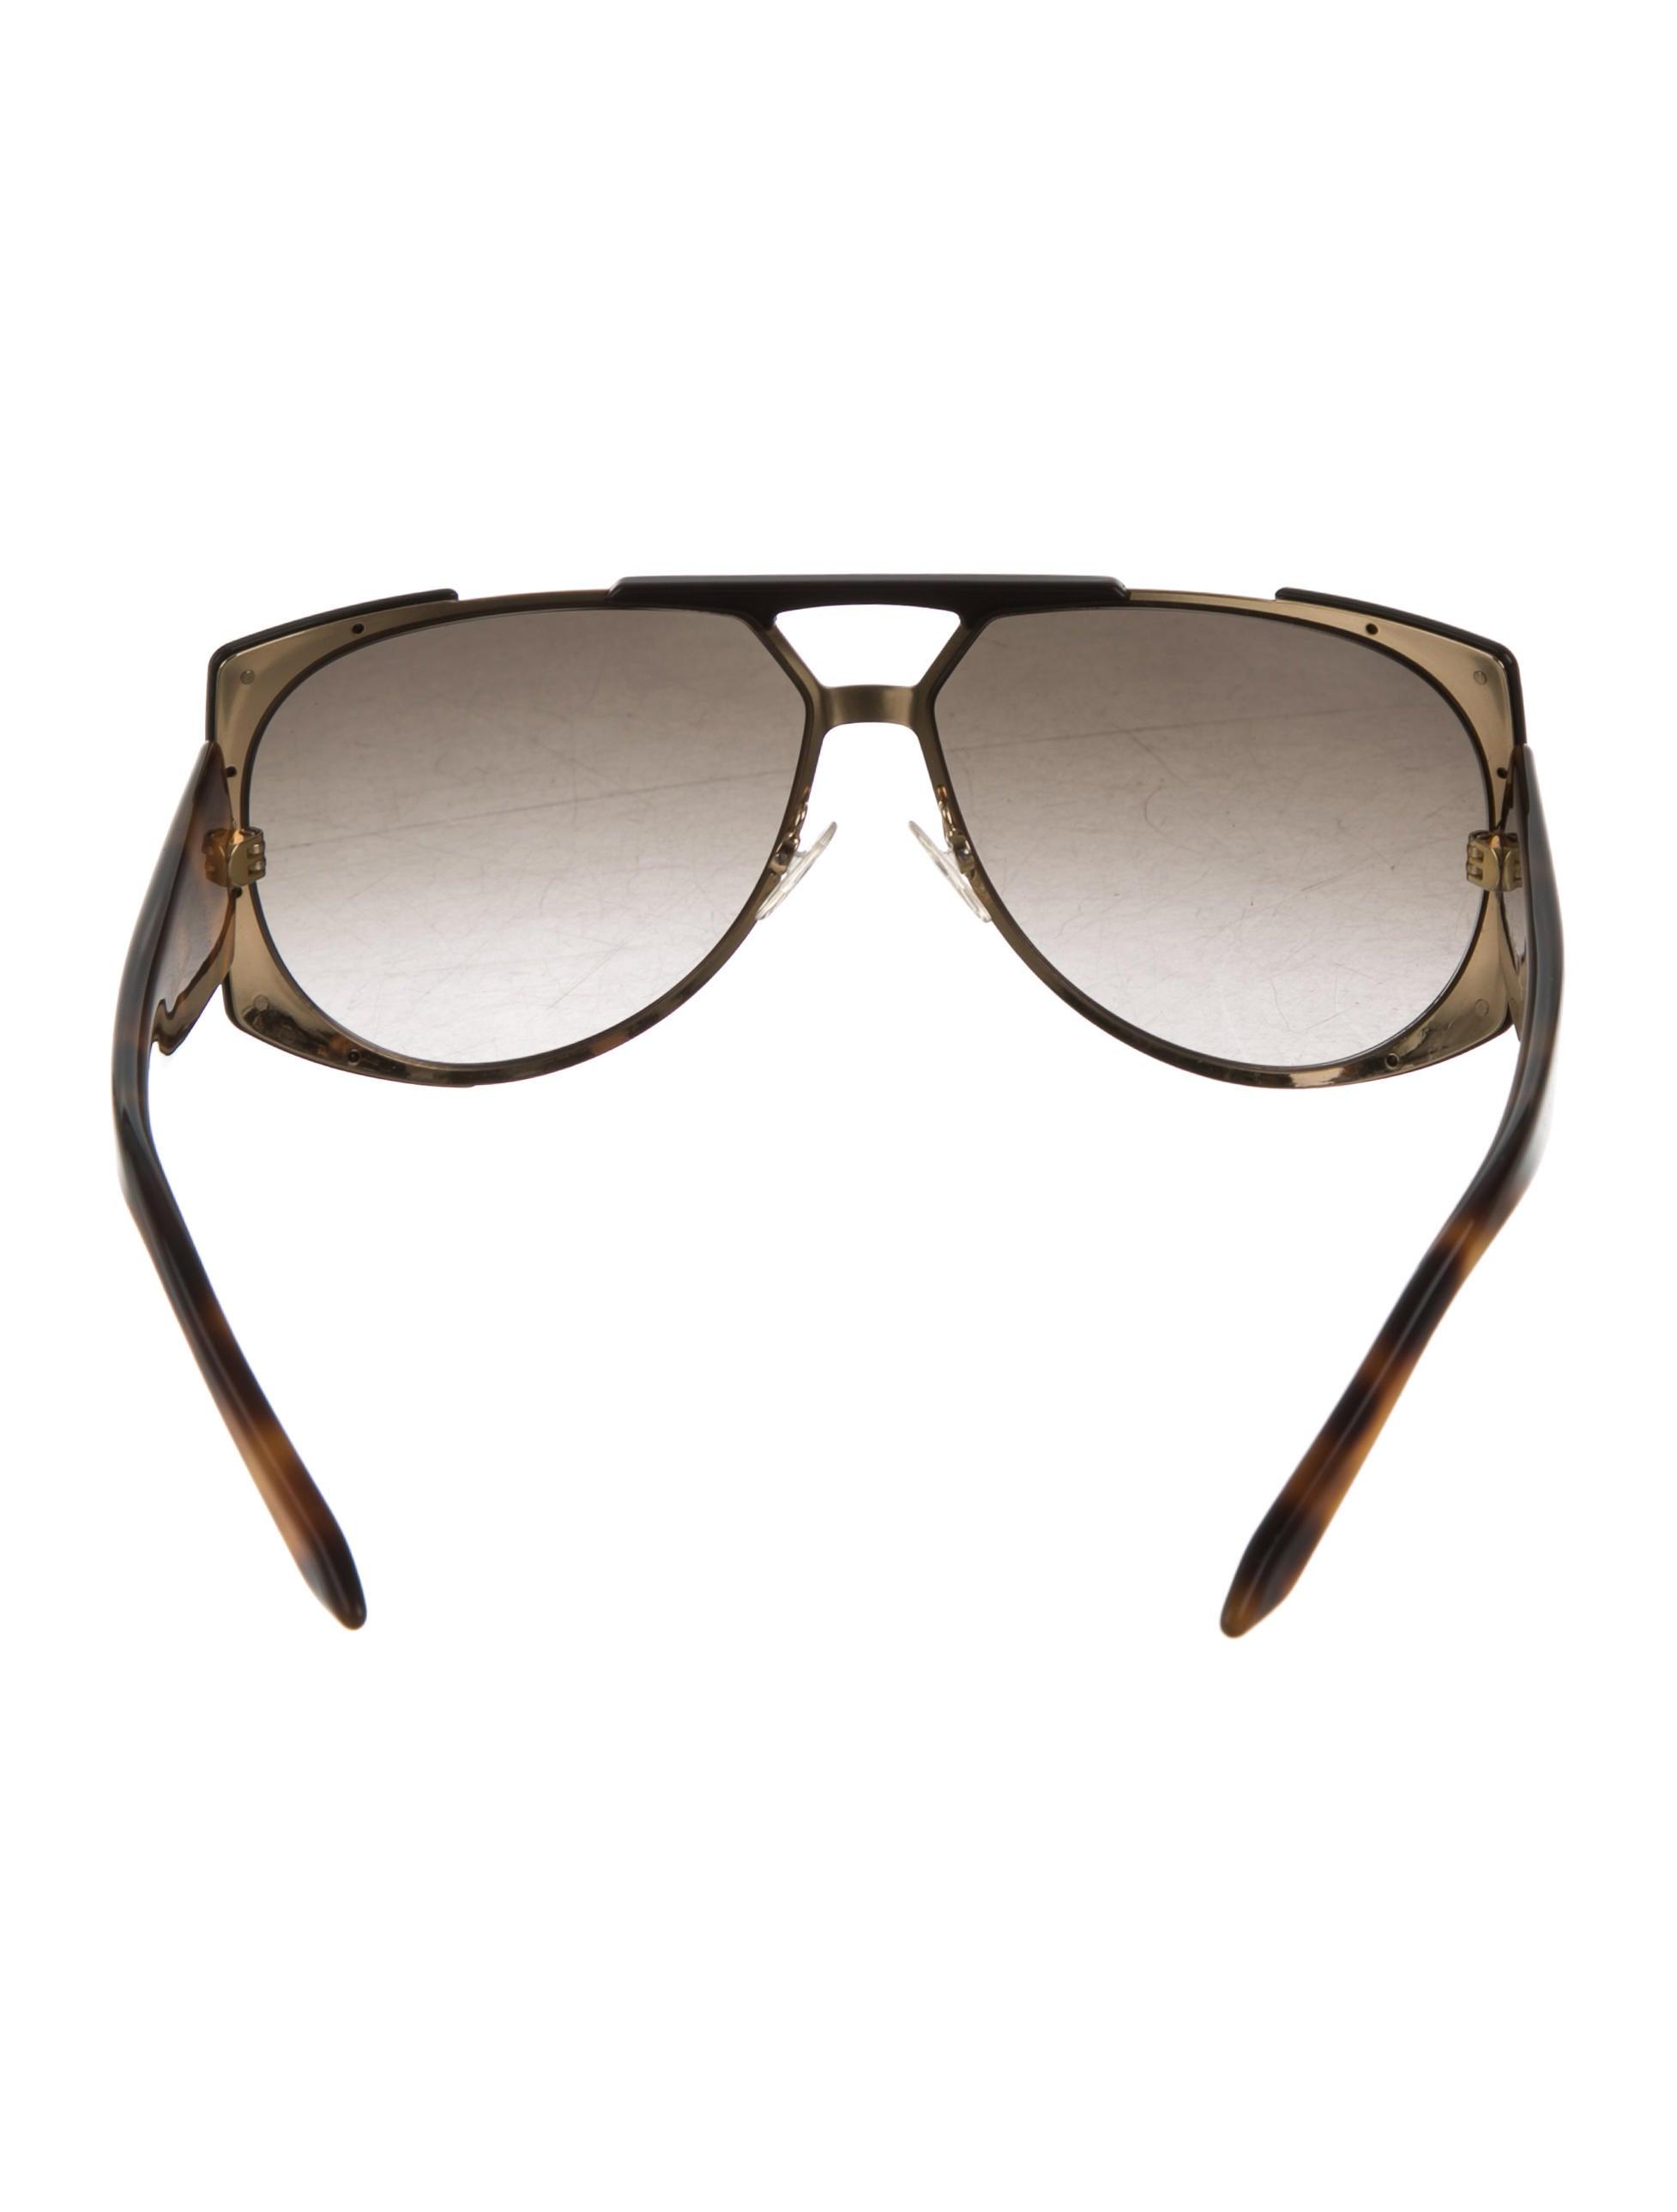 406ab4ab4a02 Dior Aviator Sunglasses Brown